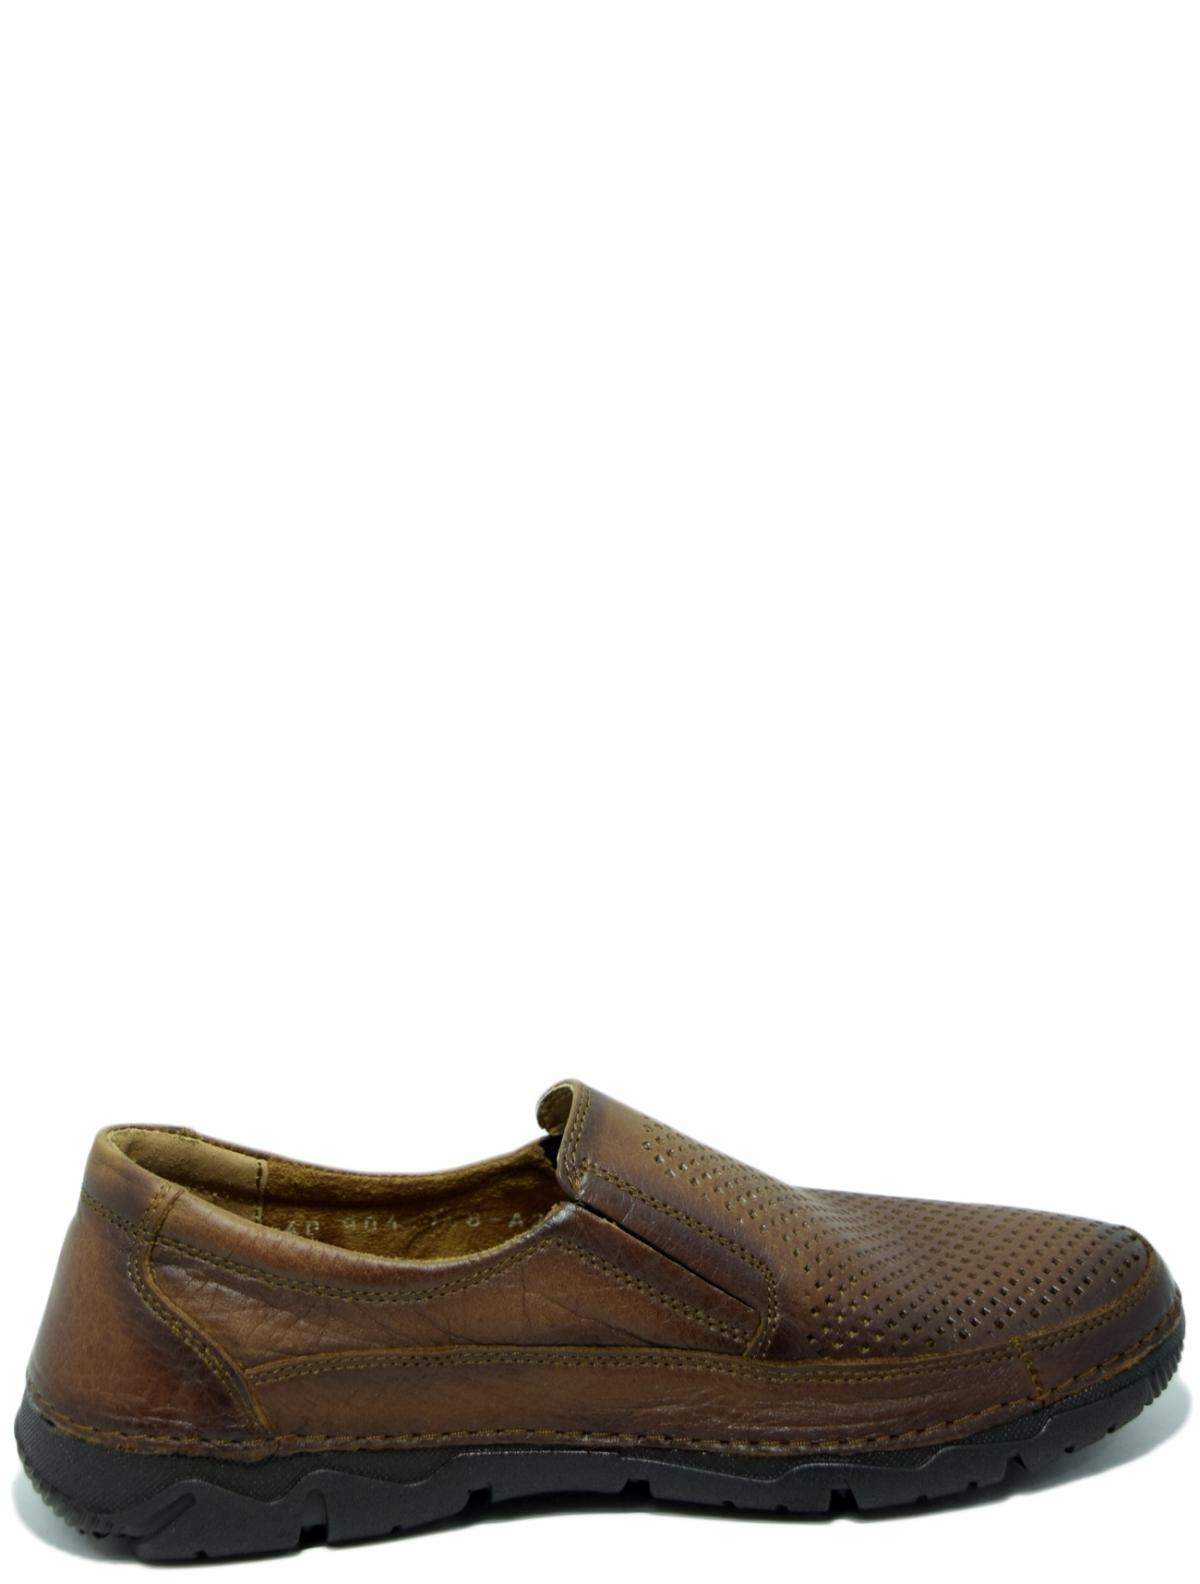 Rooman 904-158-A2L мужские туфли